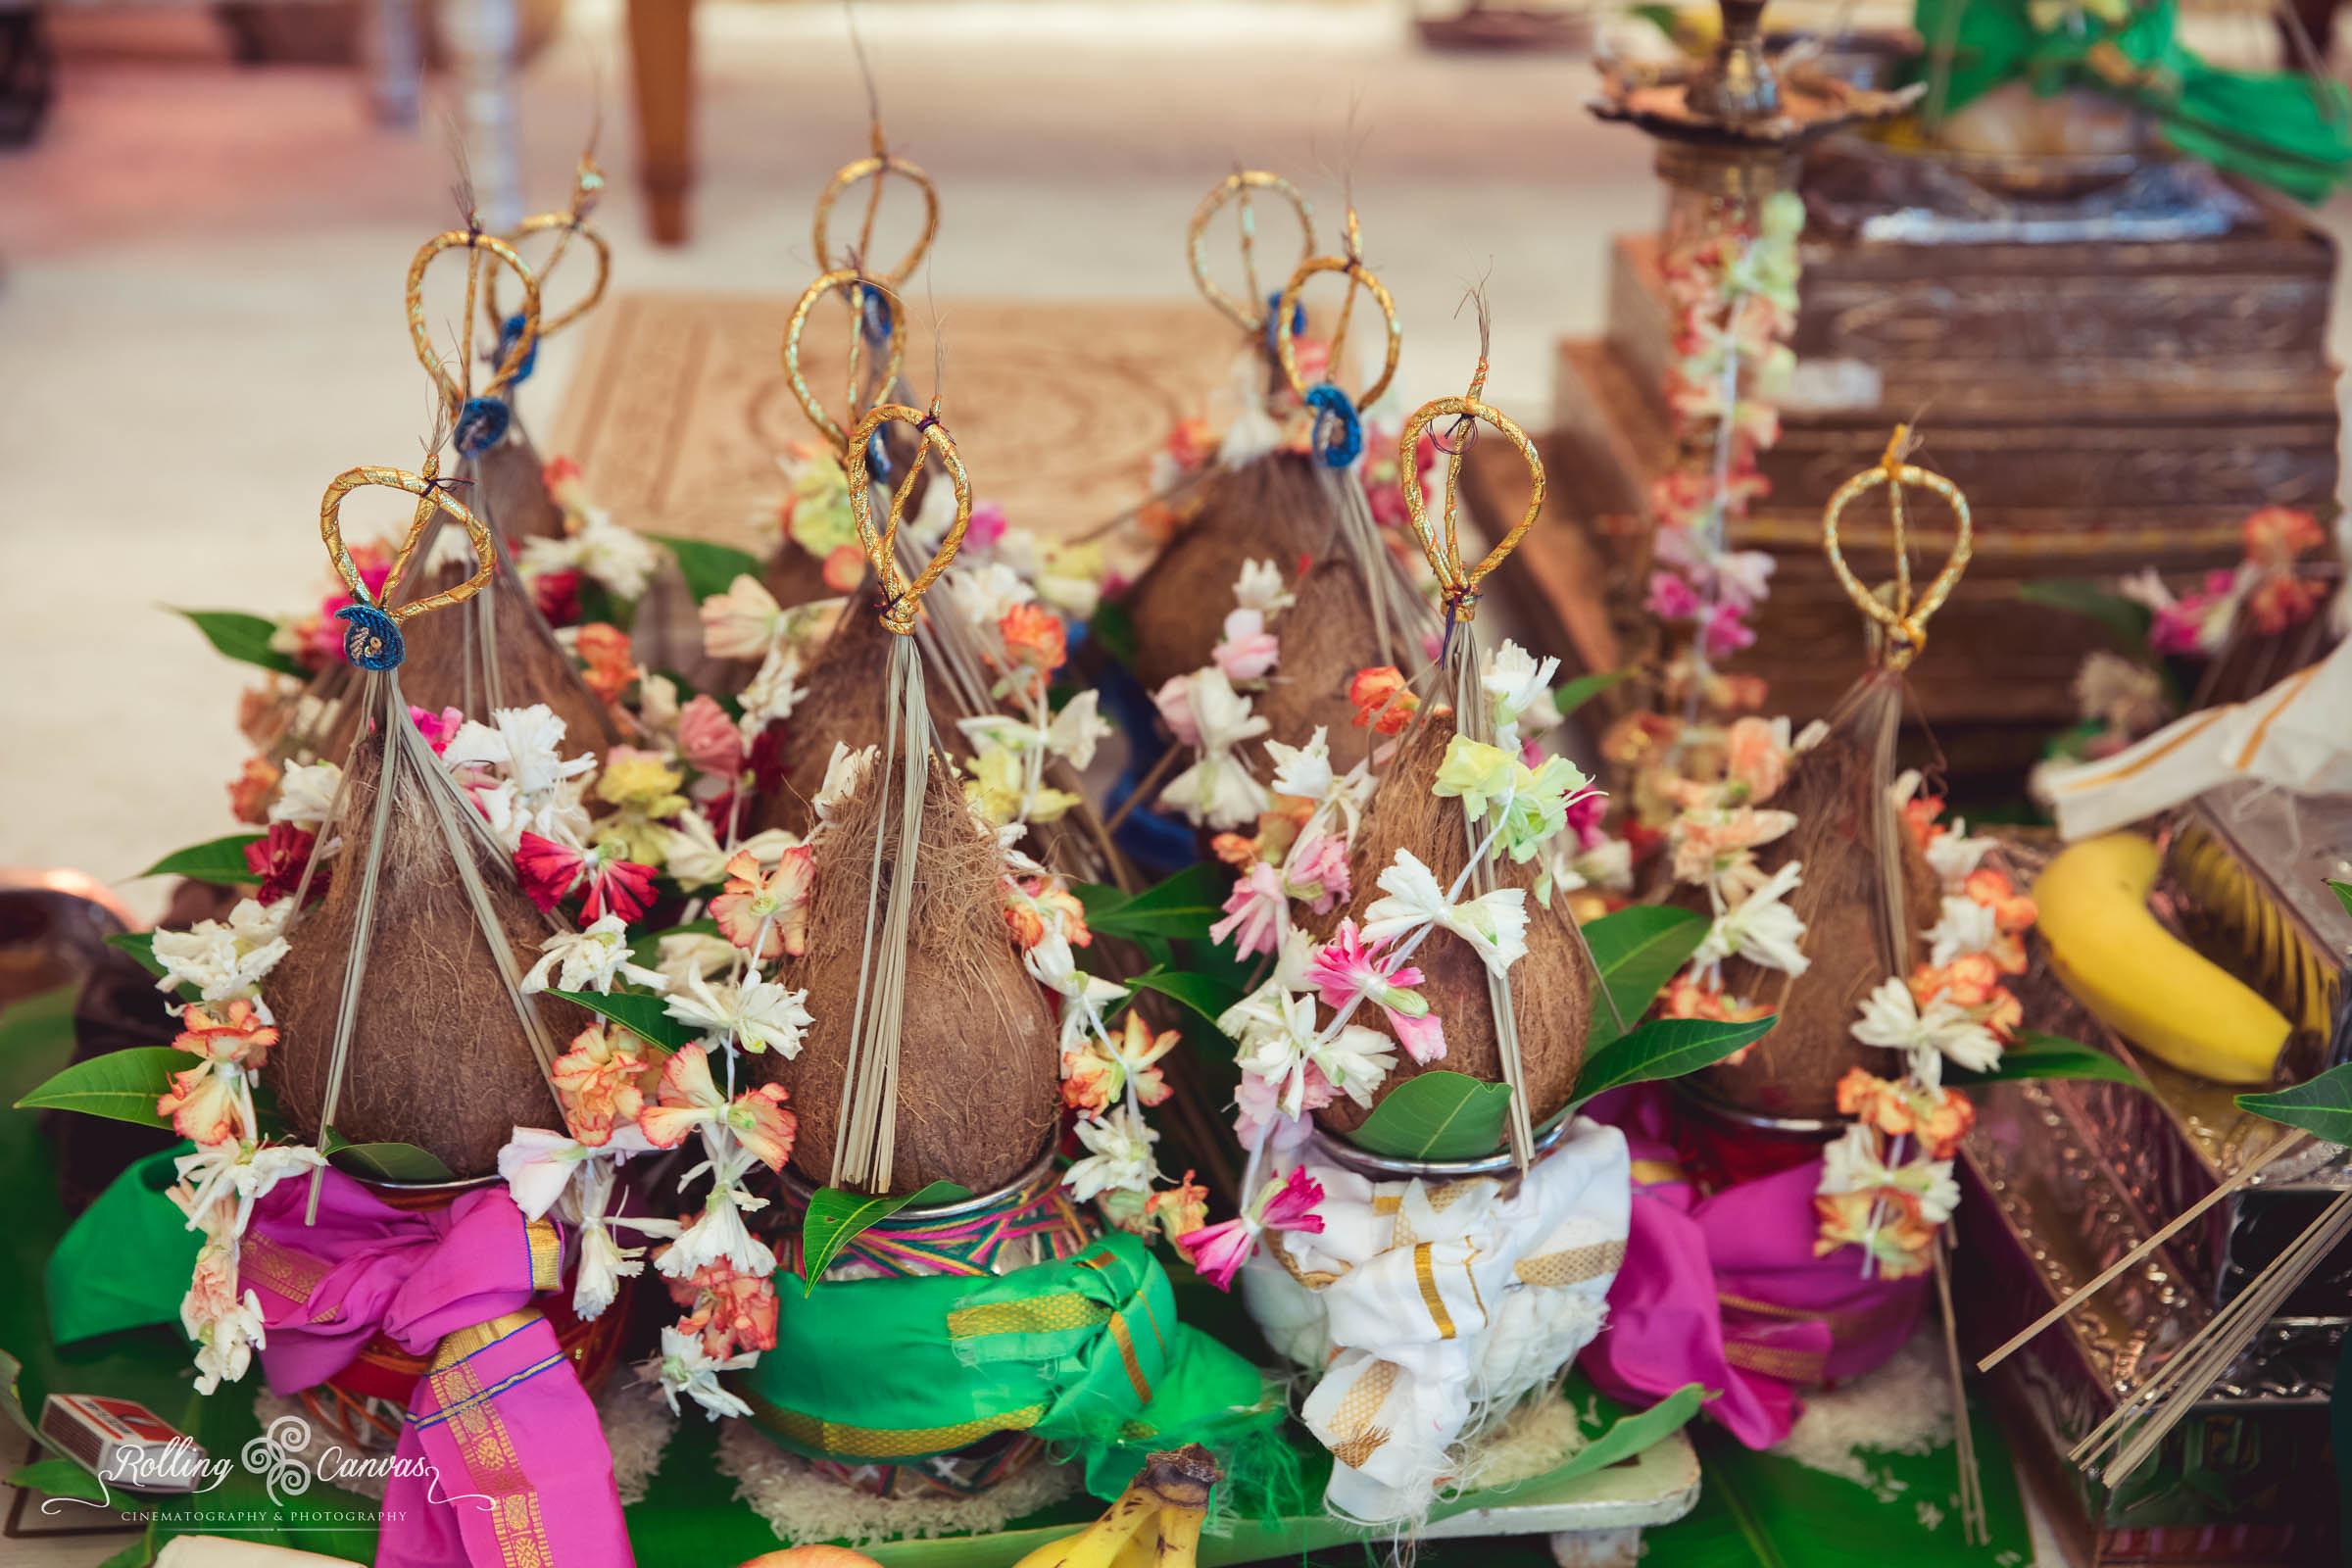 Wedding_Photography_Sydney_Rolling_Canvas_Presentation_Hindu_Ceremony_Mandap_Hyatt_Regency_Floral_Design-57071.jpg